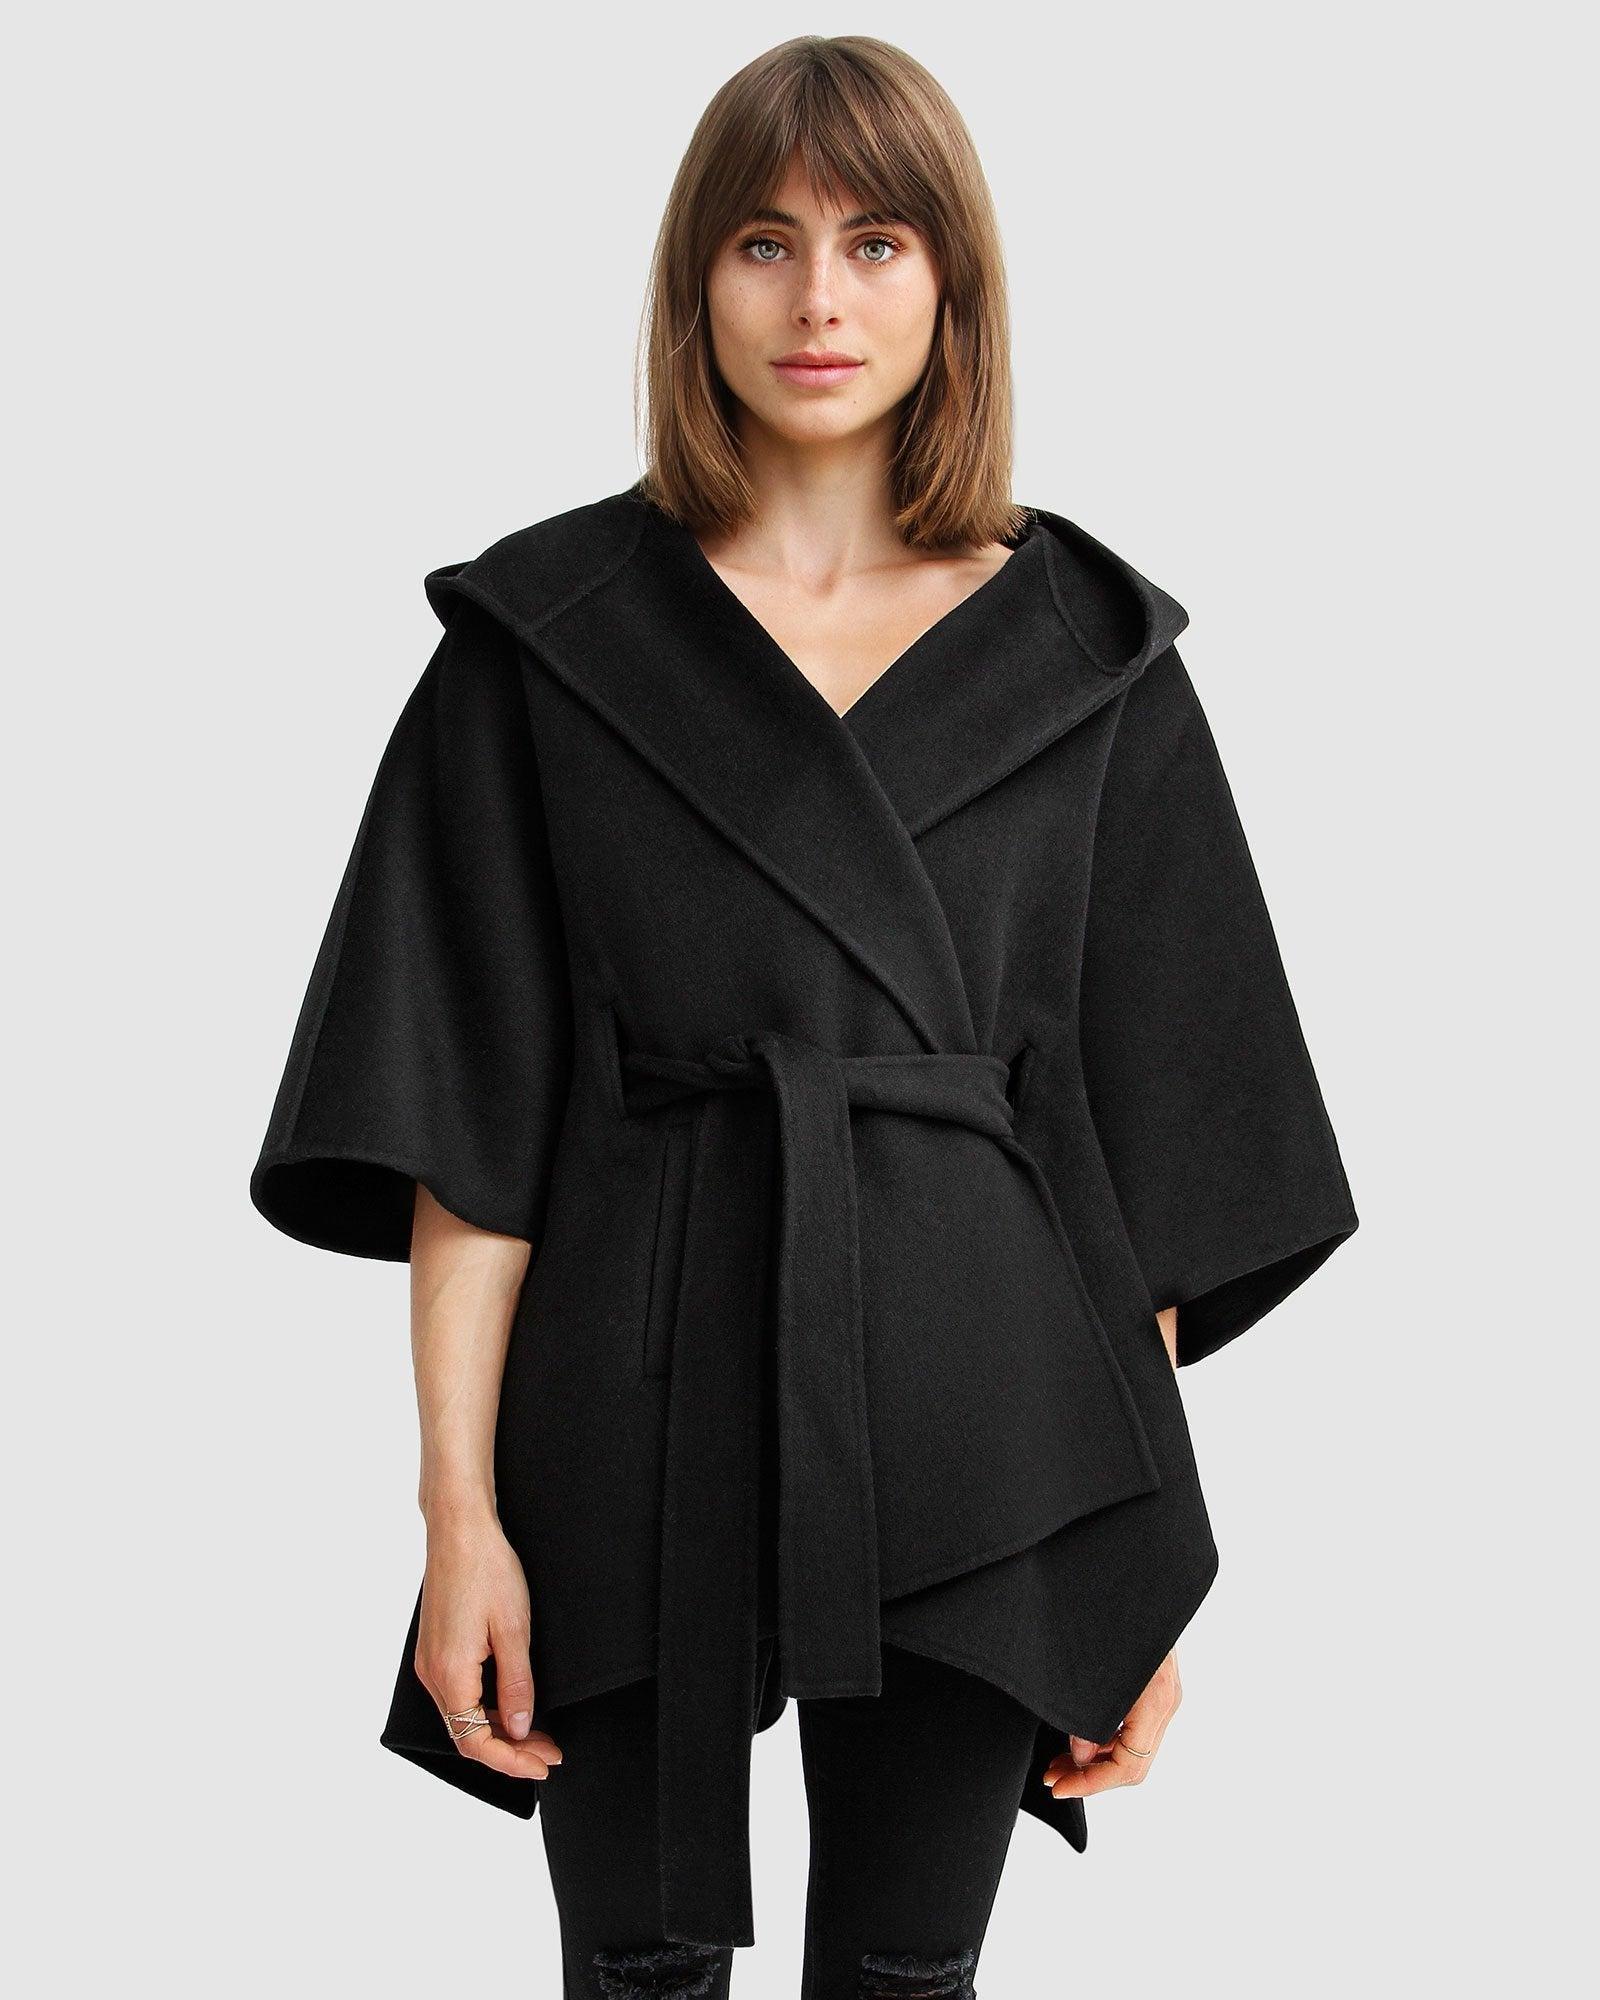 Jackson Landing Wool Blend Cape Coat - Black